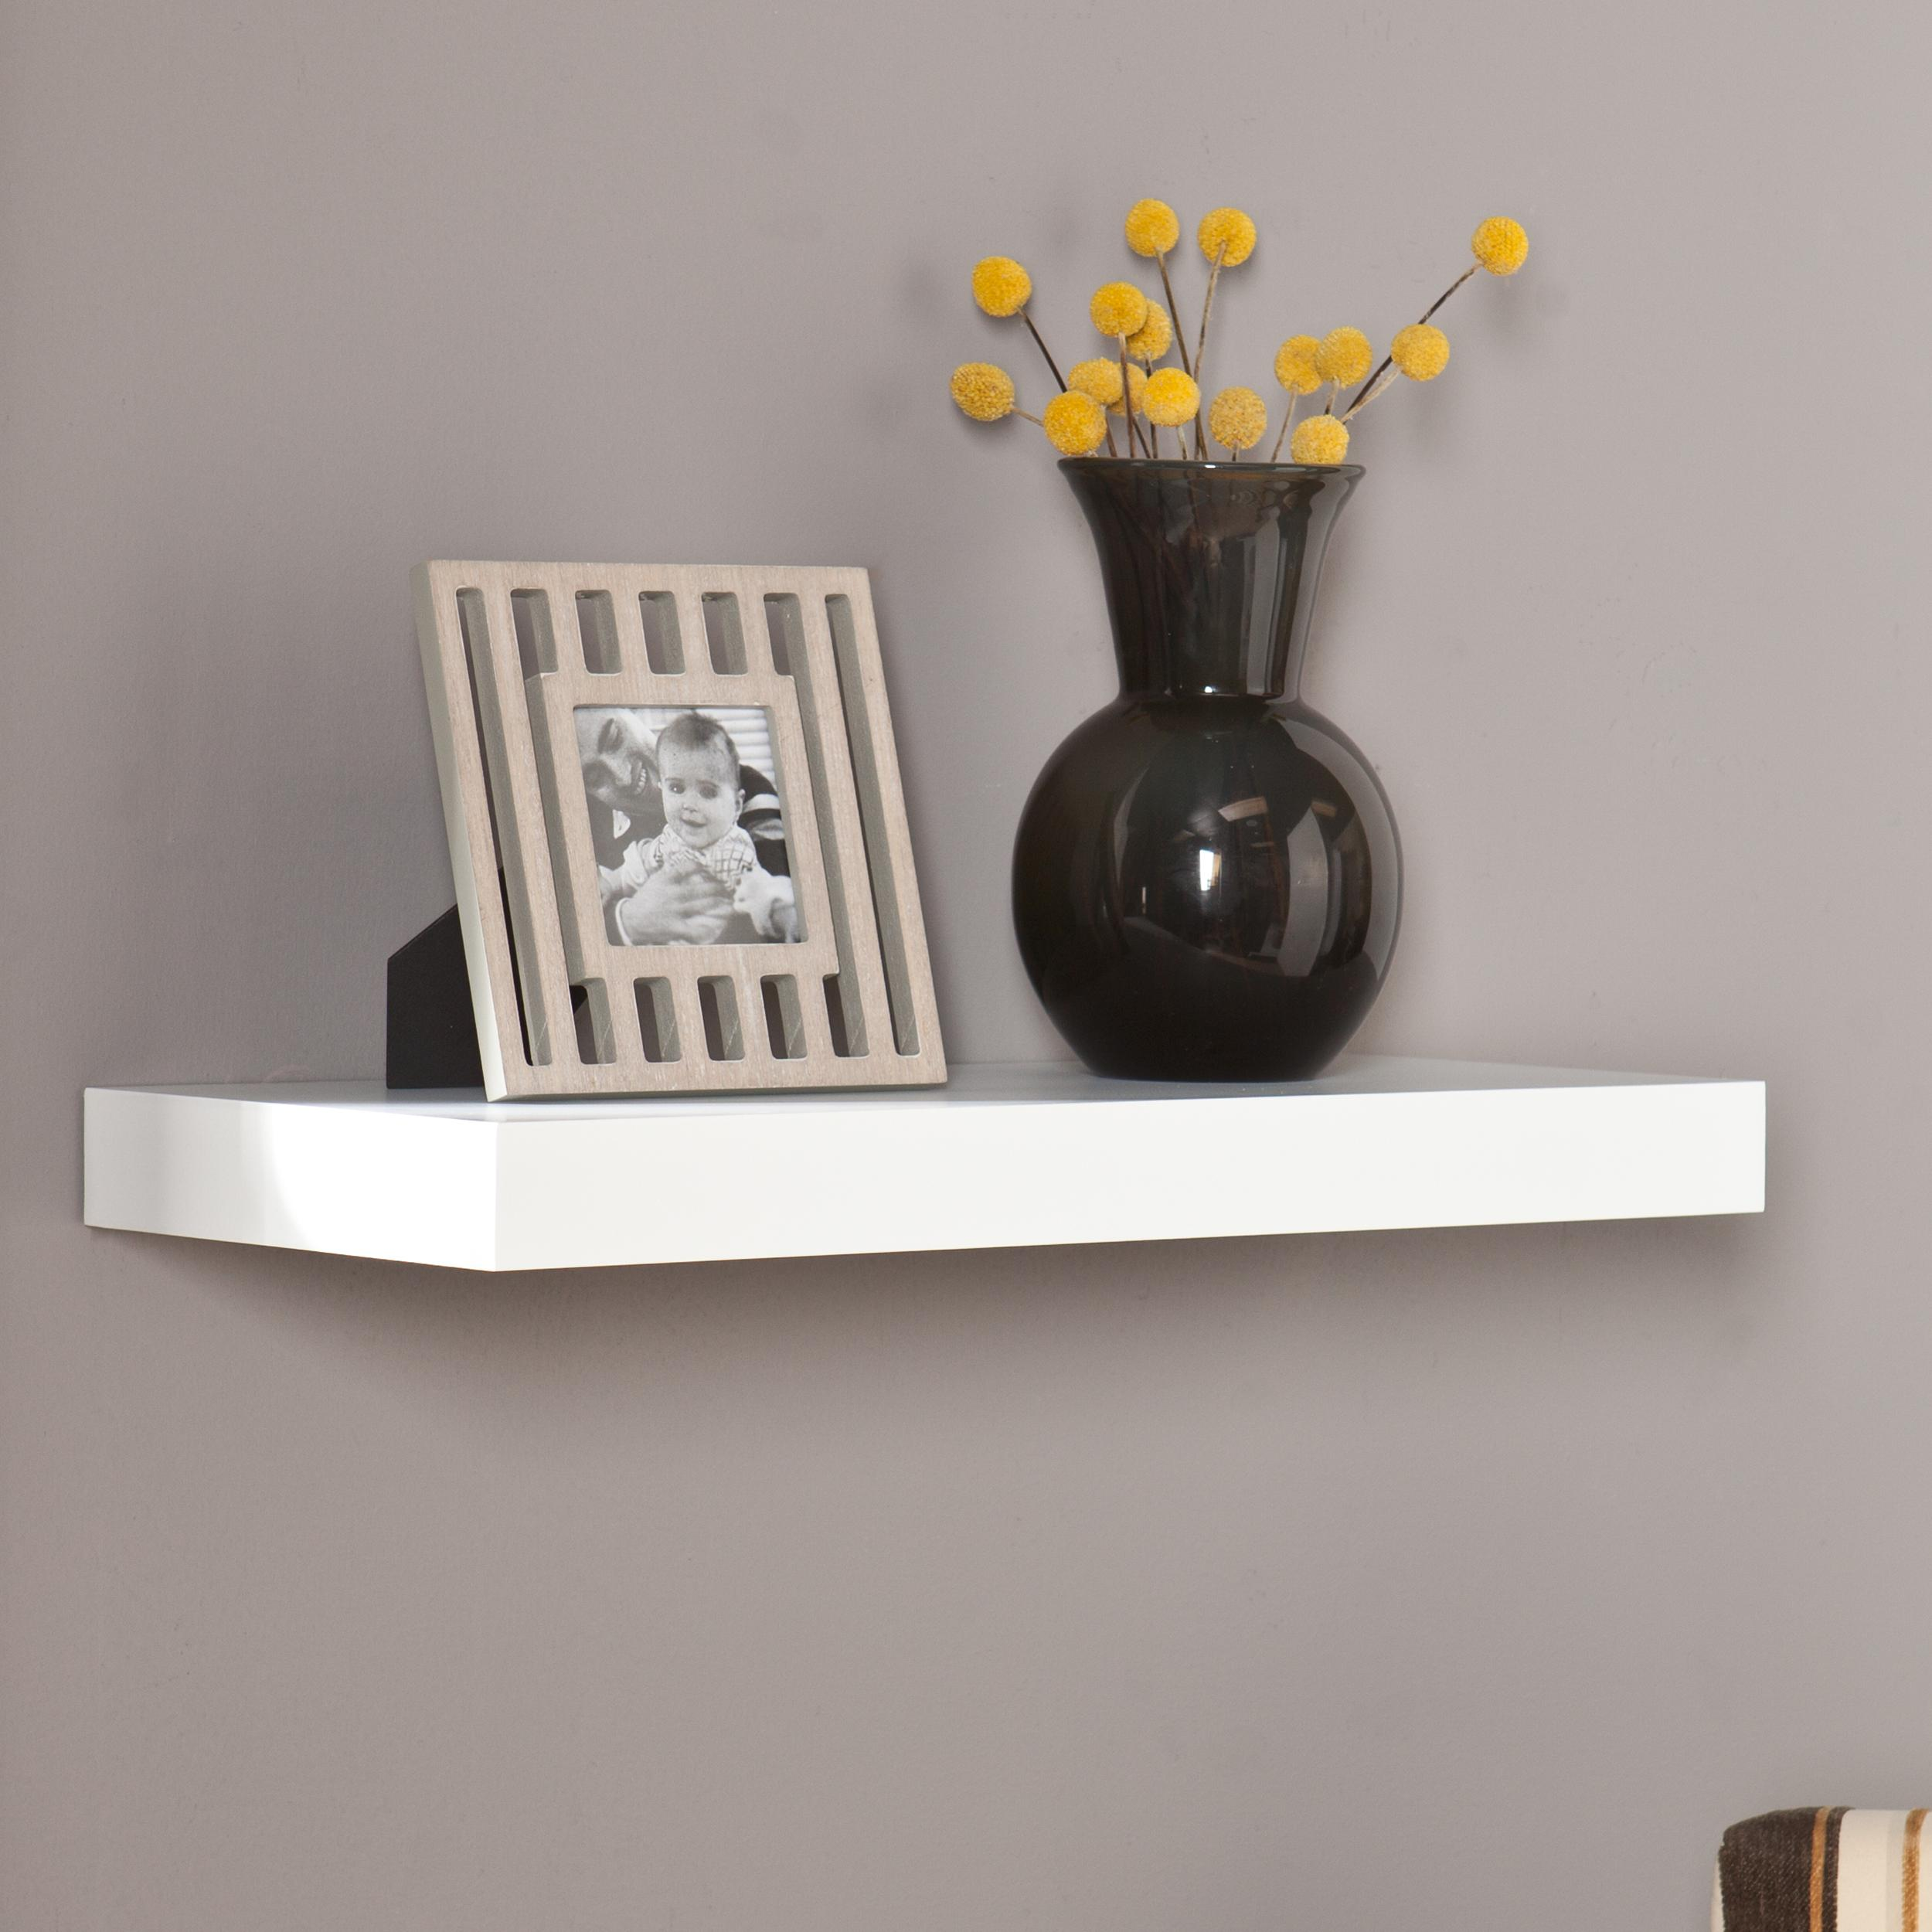 southern enterprises chicago floating wall shelf 24 wide white finish home kitchen. Black Bedroom Furniture Sets. Home Design Ideas